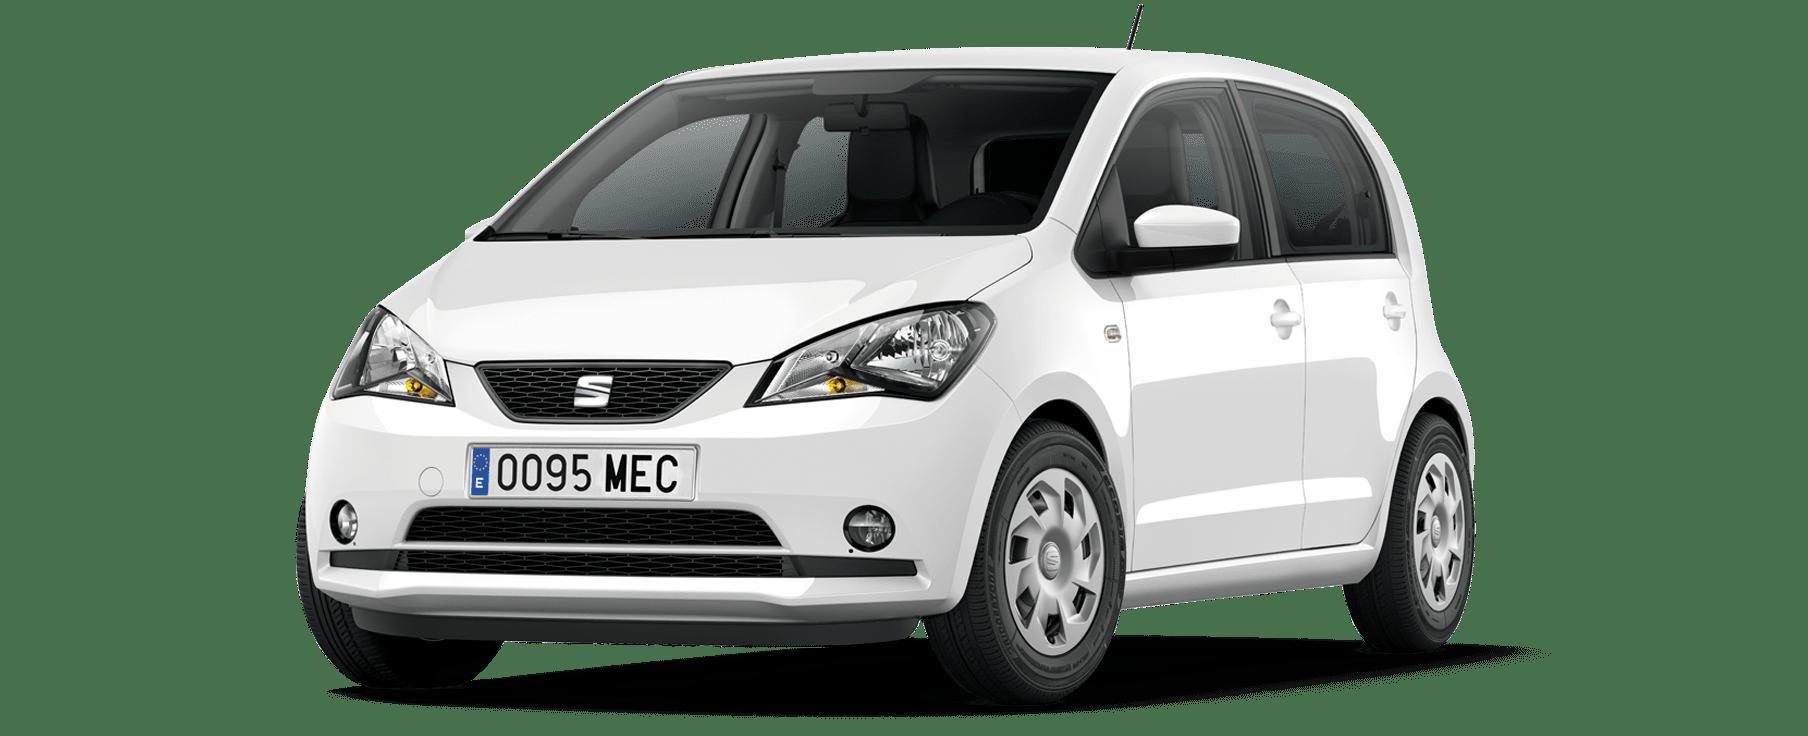 SEAT Mii coche eléctrico español